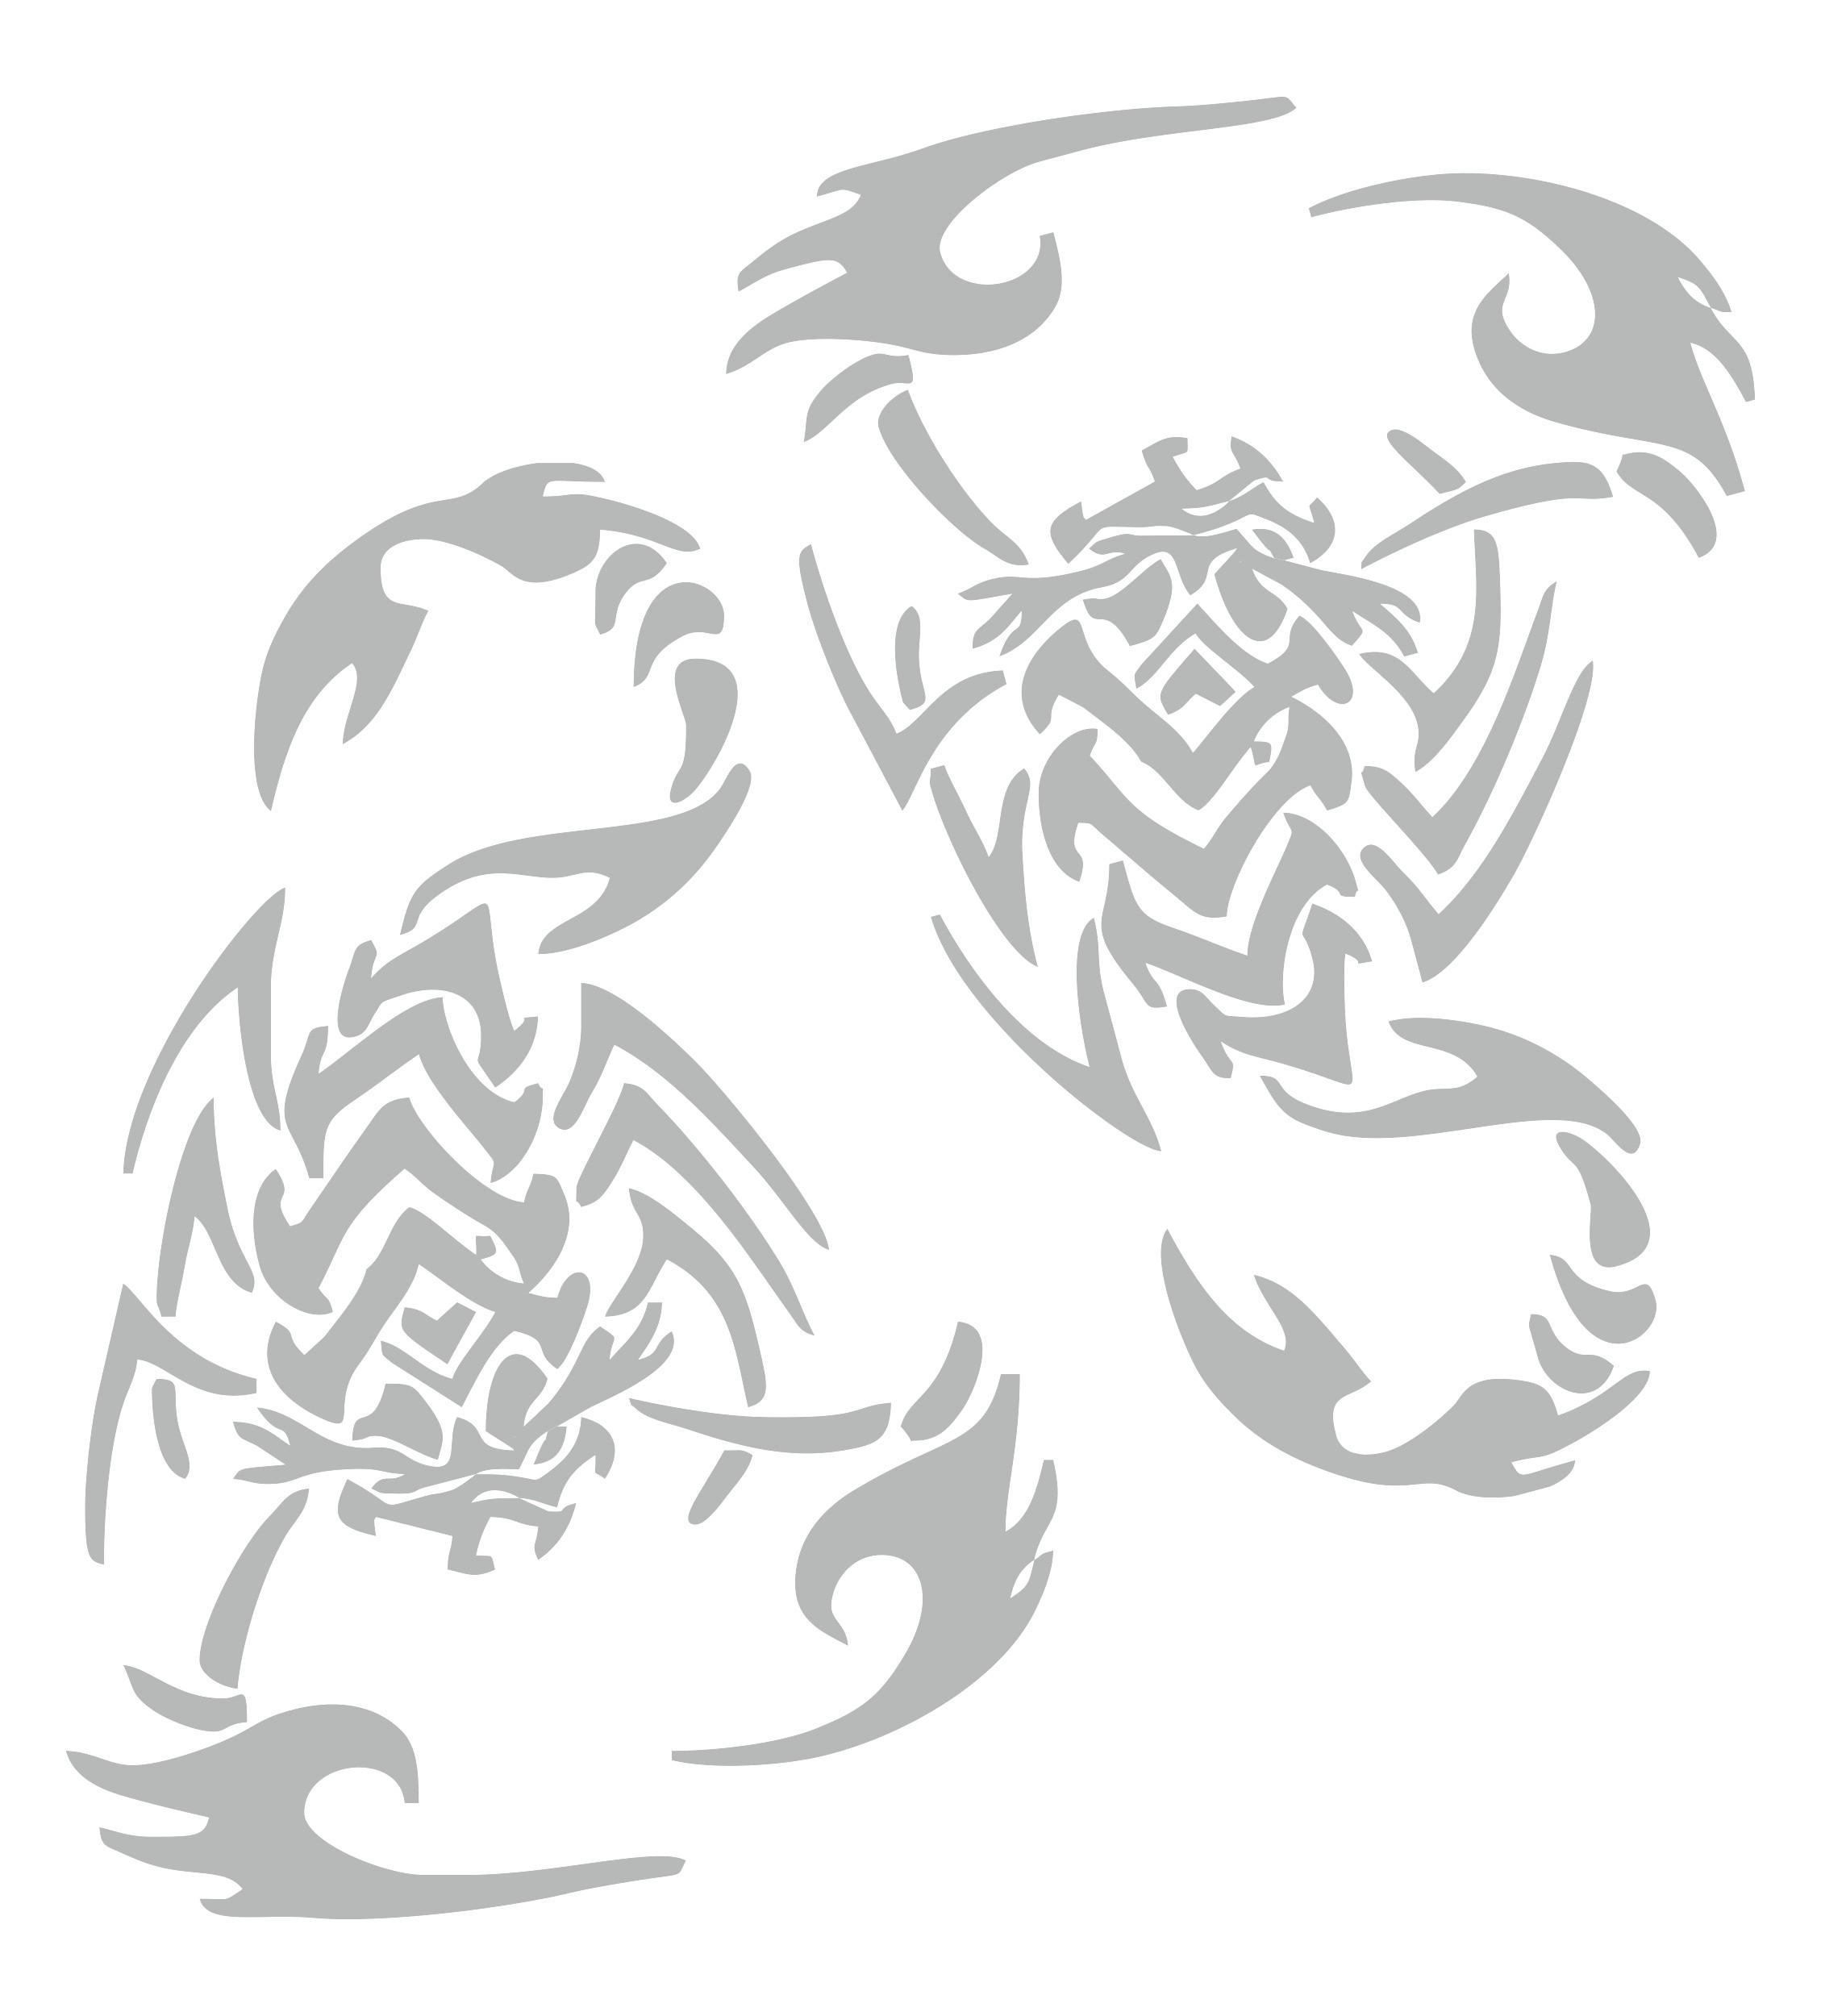 Sticker mirror- and car-tattoo scorpion